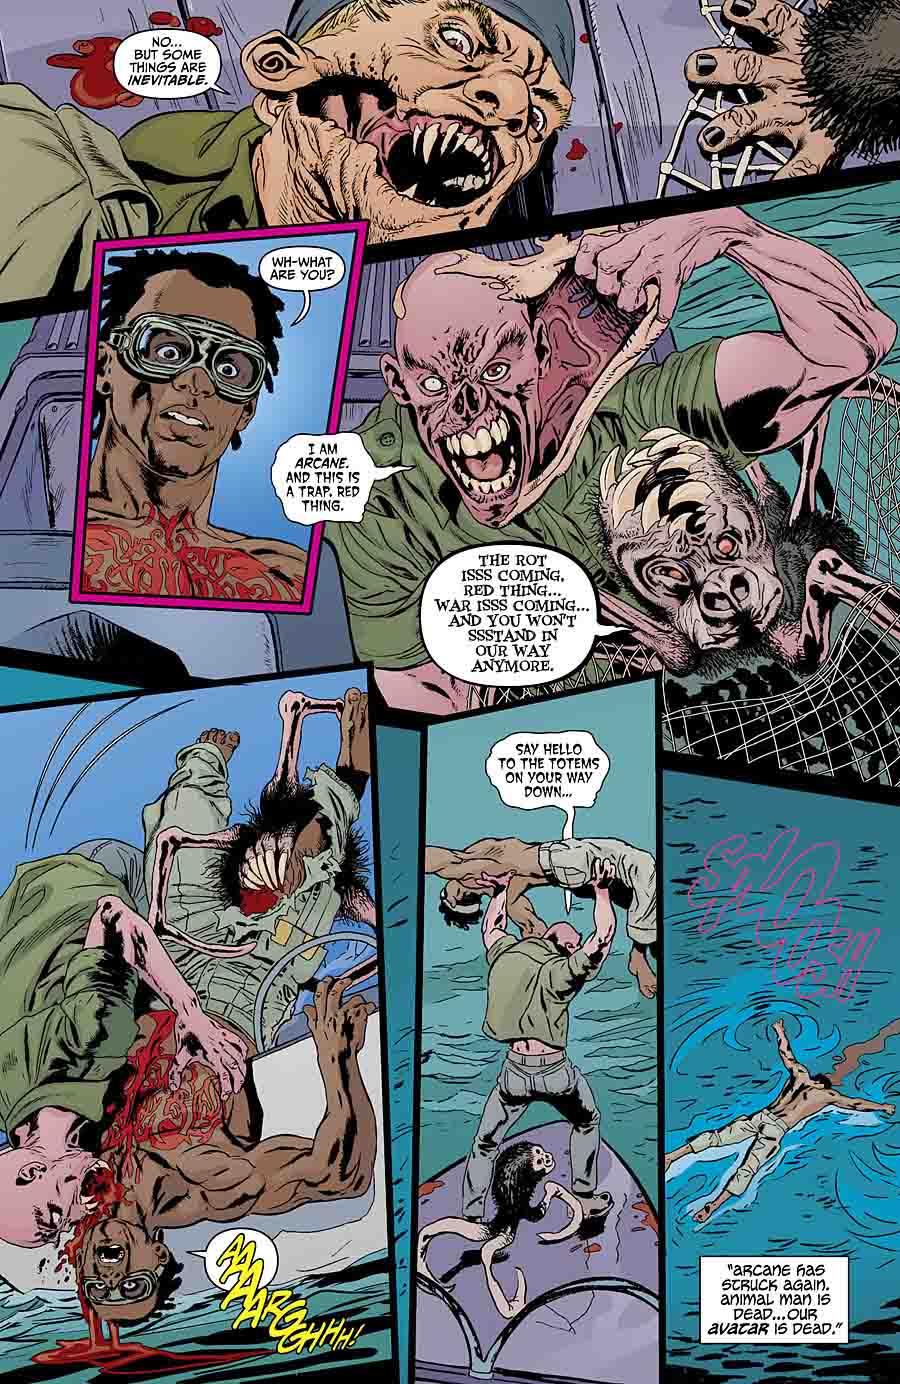 Golem-Comics-resena-Animal-man-morrison-03